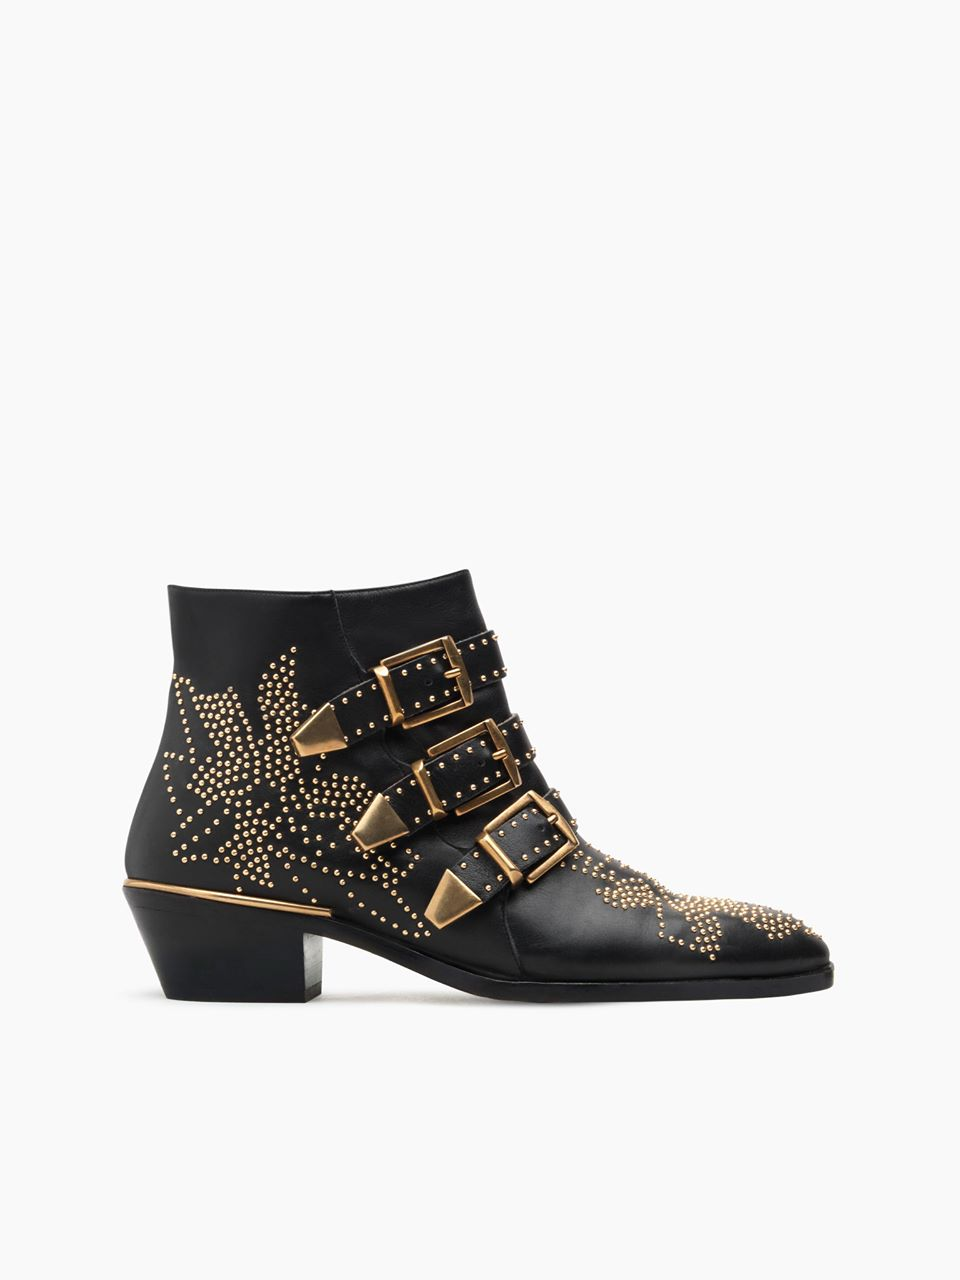 CHLOÉ Susanna short boot Women's Black Gold 100% Sheepskin